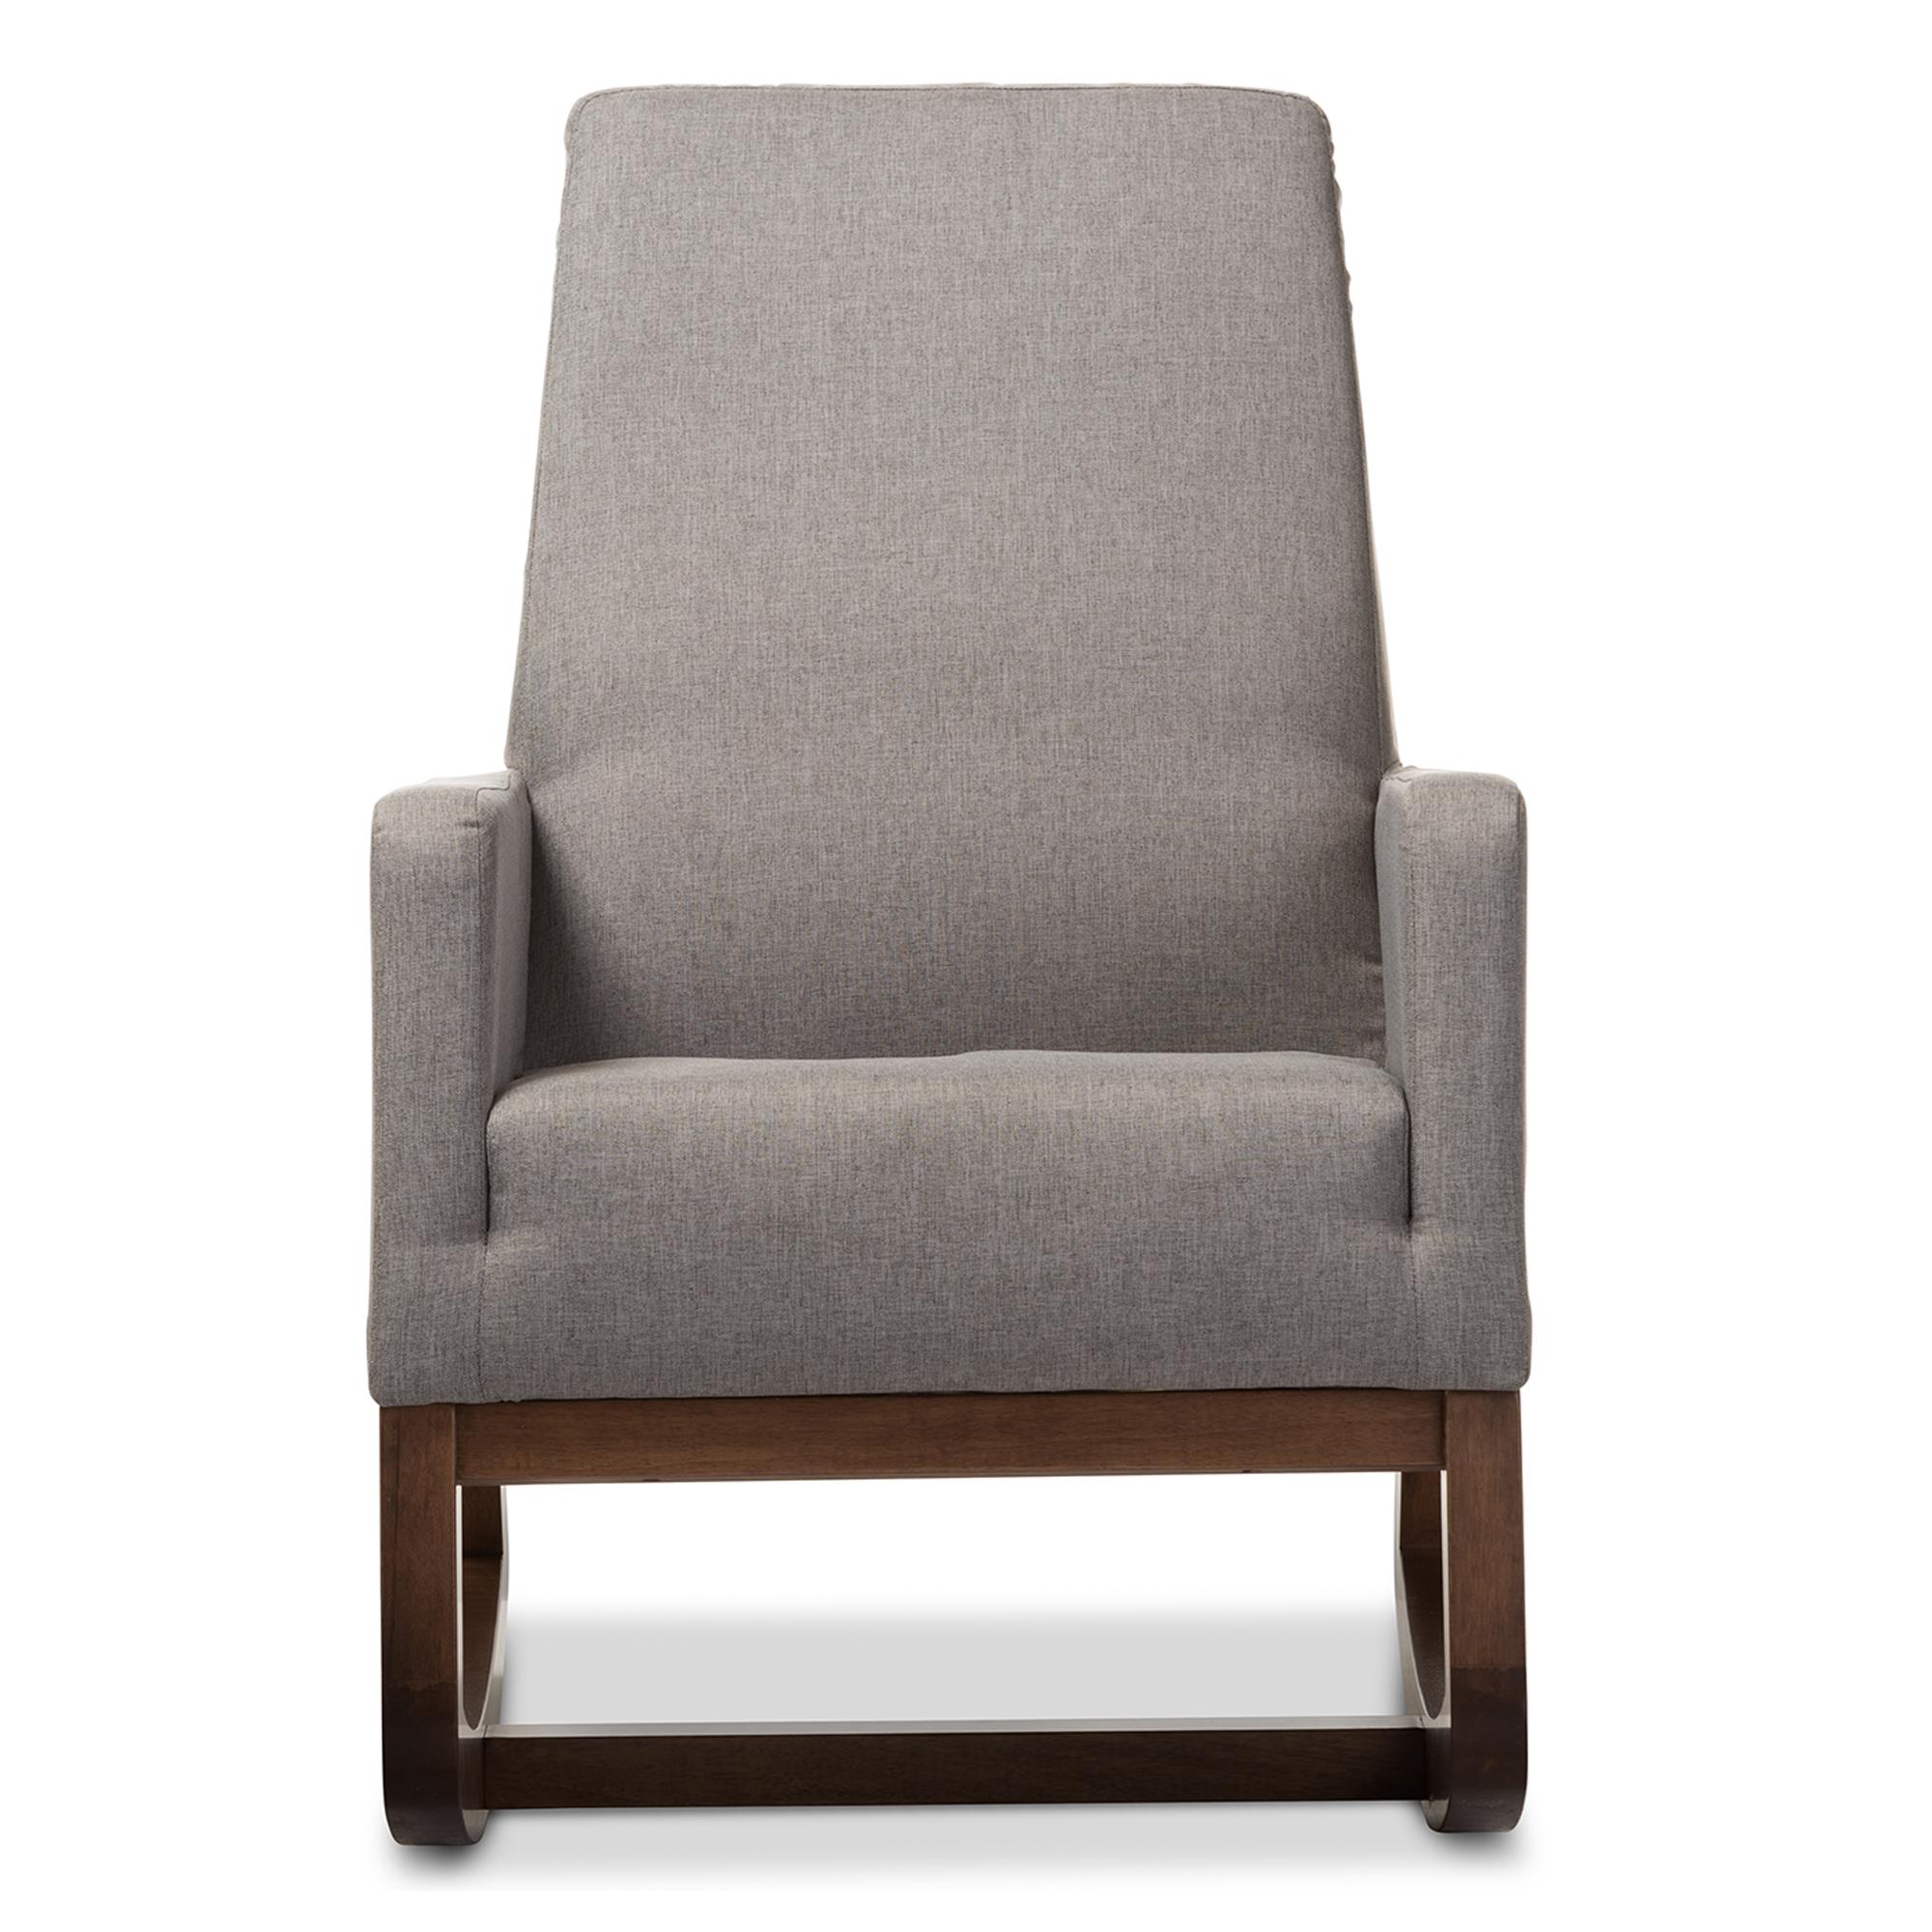 cheap modern rocking chair lazboy office baxton studio yashiya mid century retro grey fabric upholstered